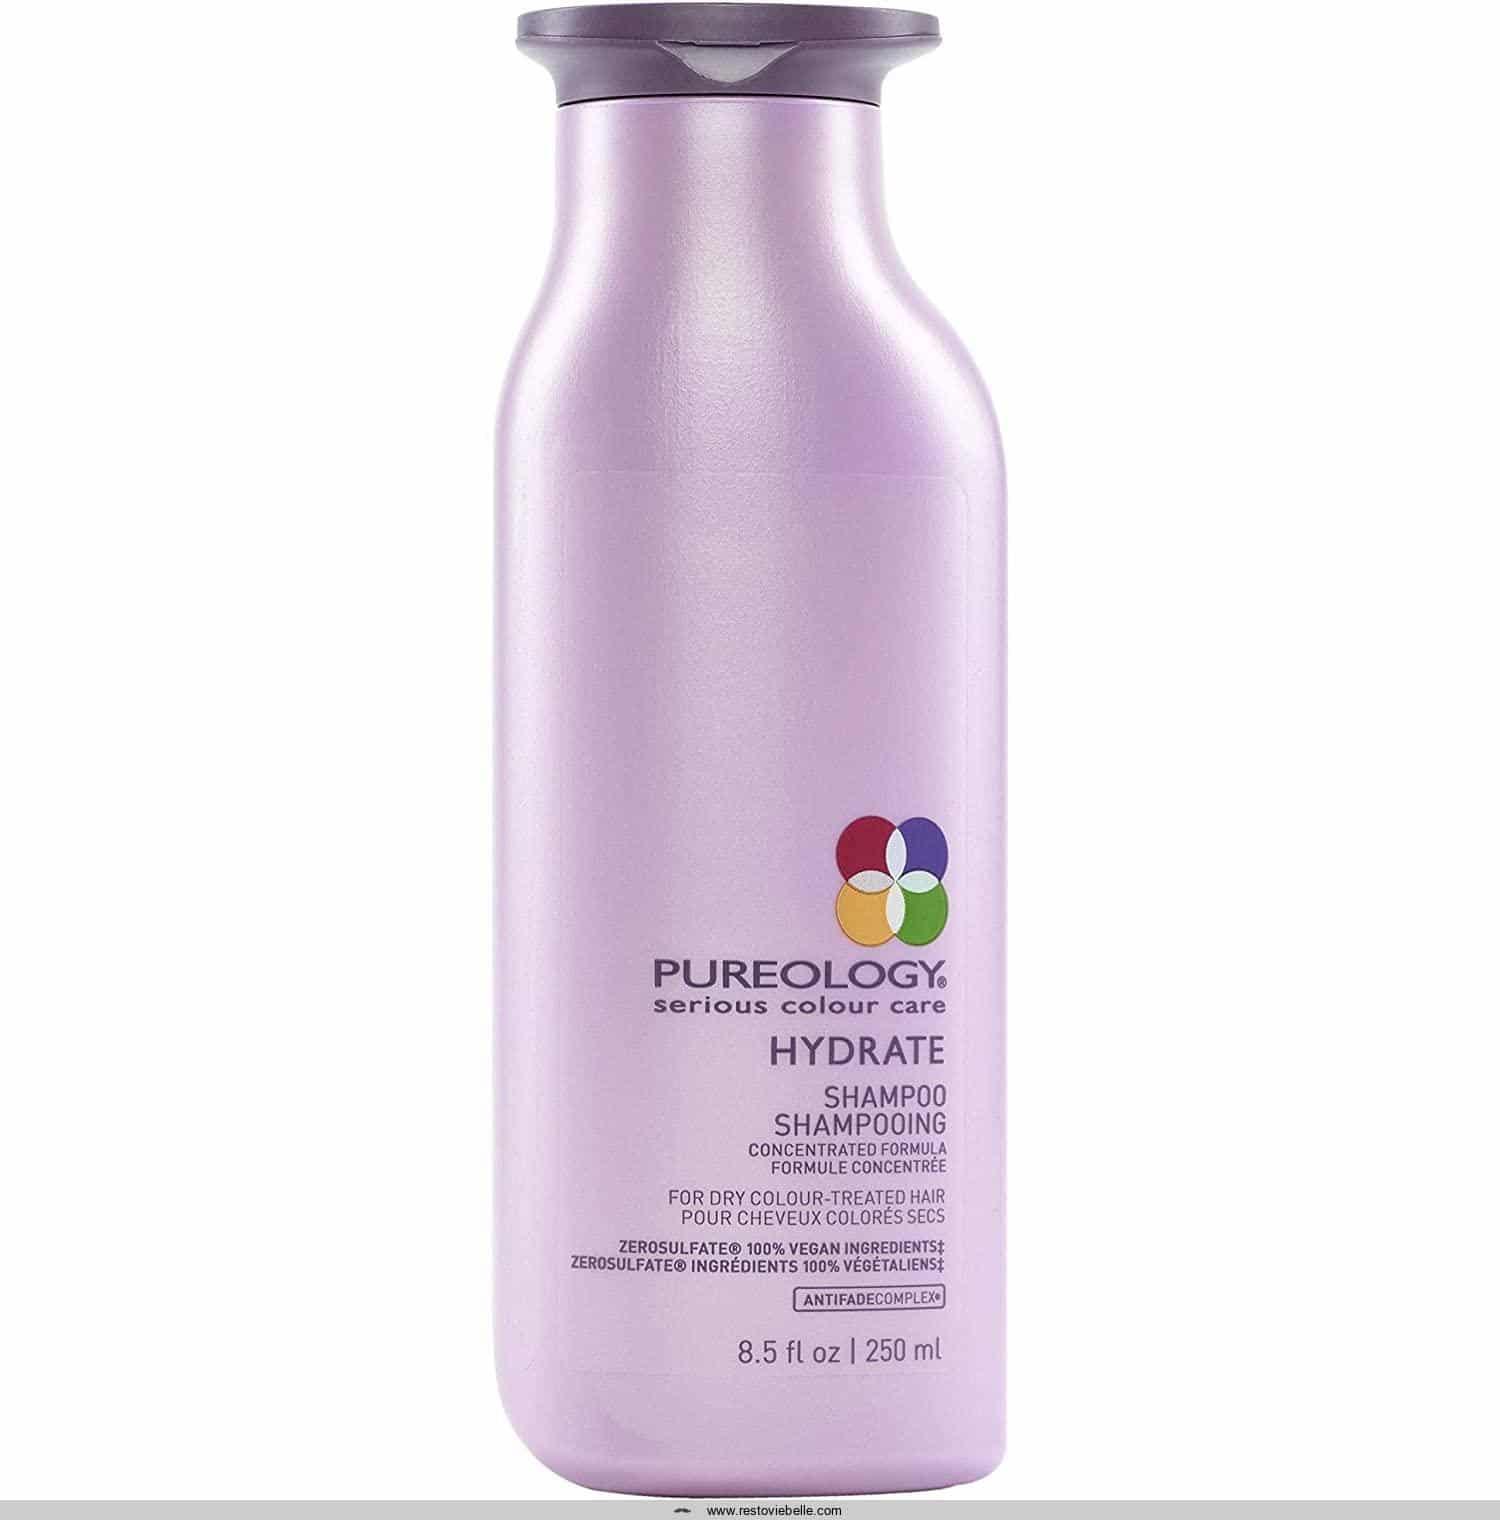 Pureology Hydrate Moisturizing Shampoo |